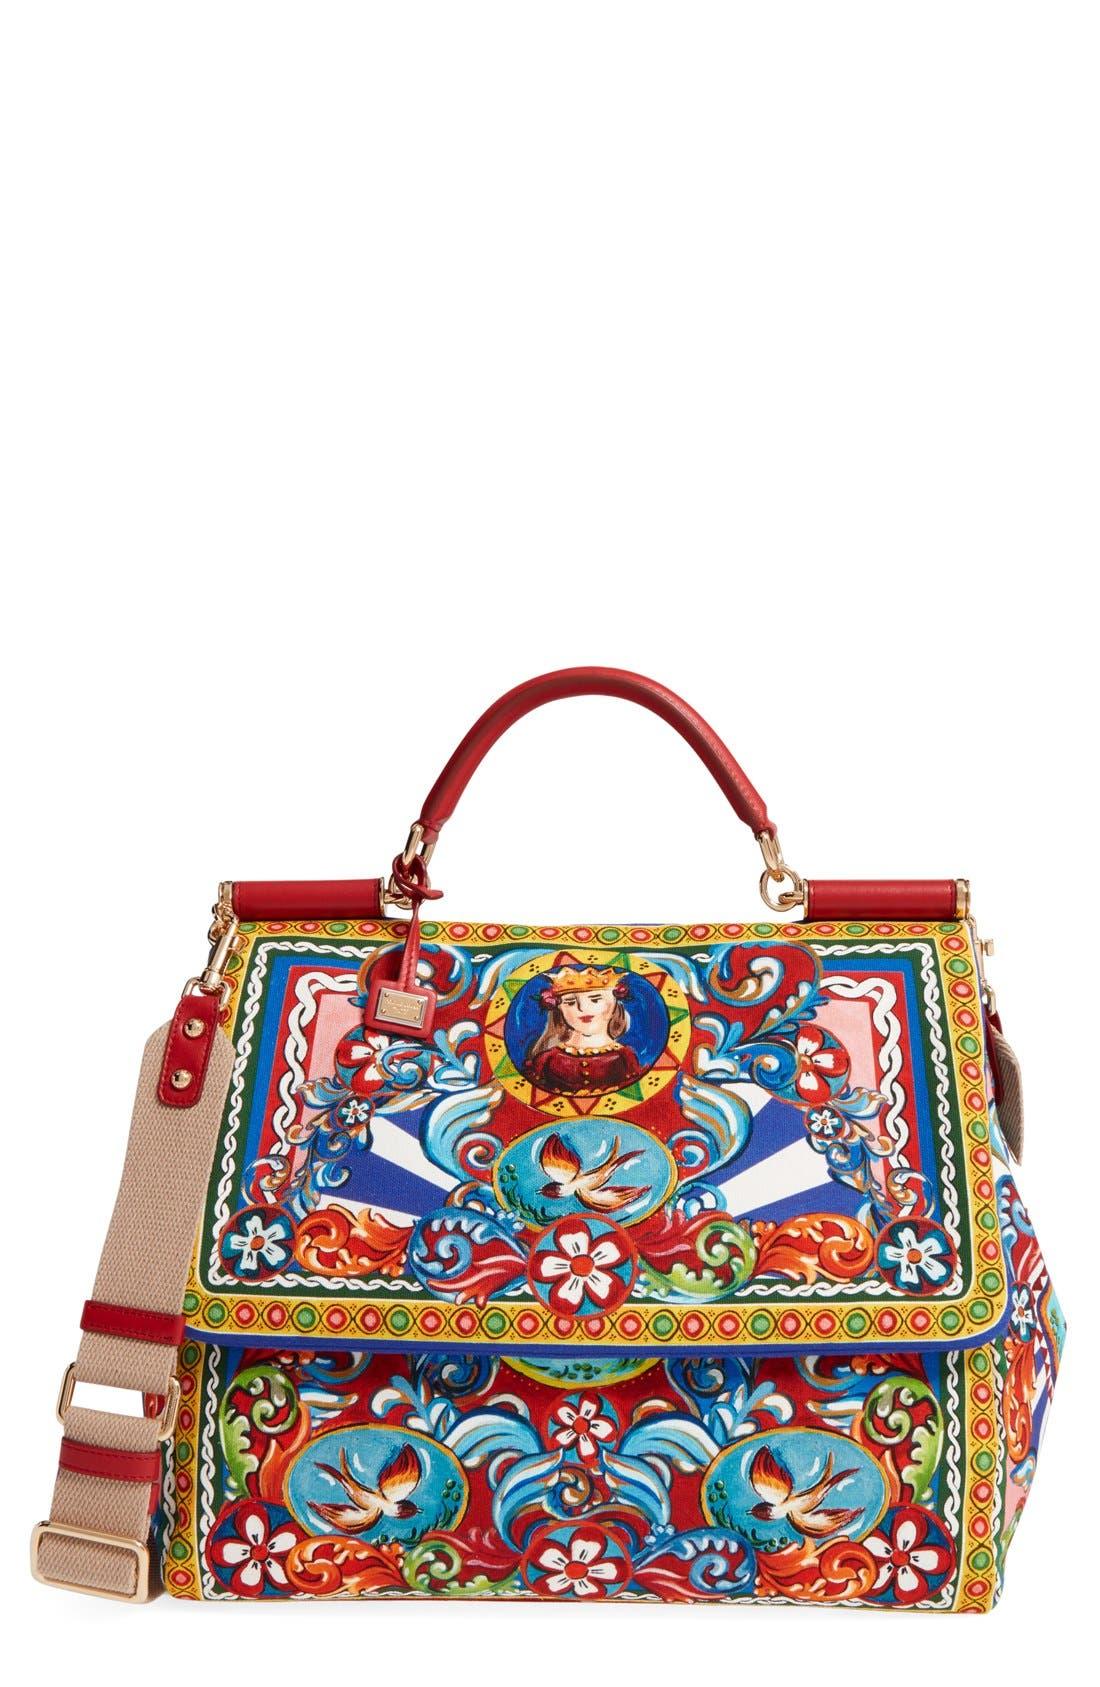 Main Image - Dolce&Gabbana 'Large Miss Sicily' Carretto Print Top Handle Canvas Satchel